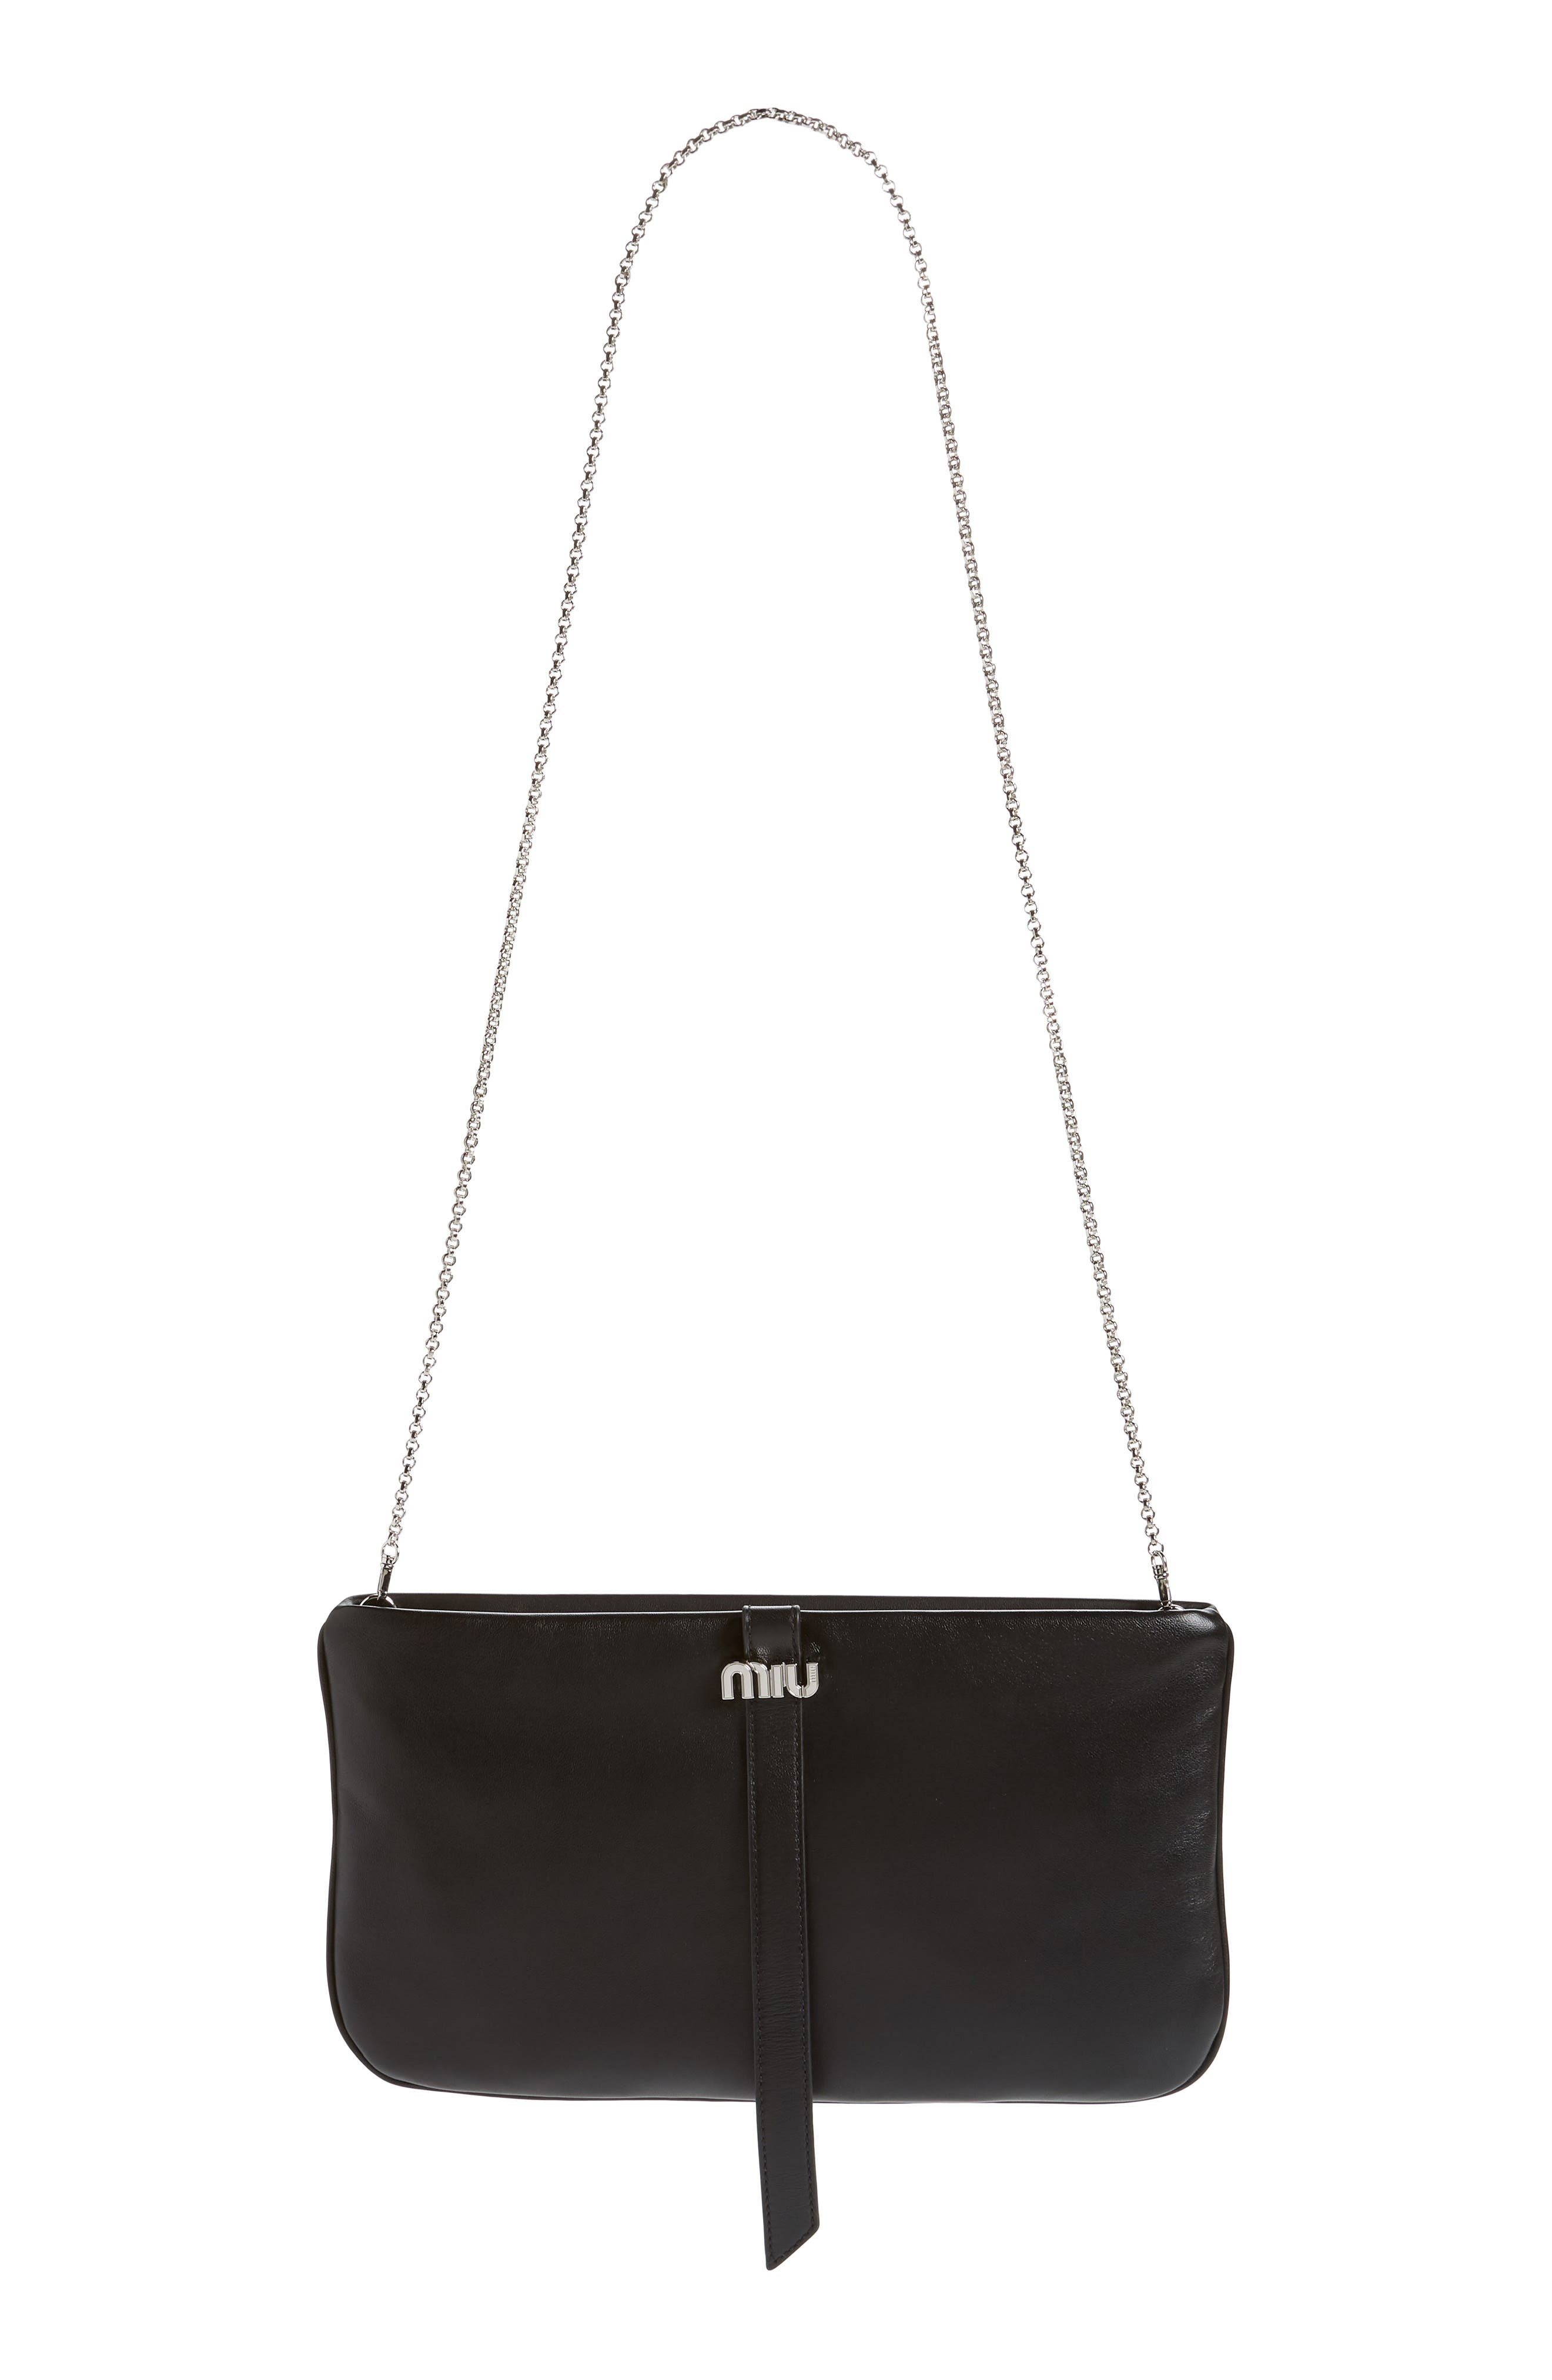 MIU MIU Lambskin Leather Clutch on a Chain, Main, color, NERO